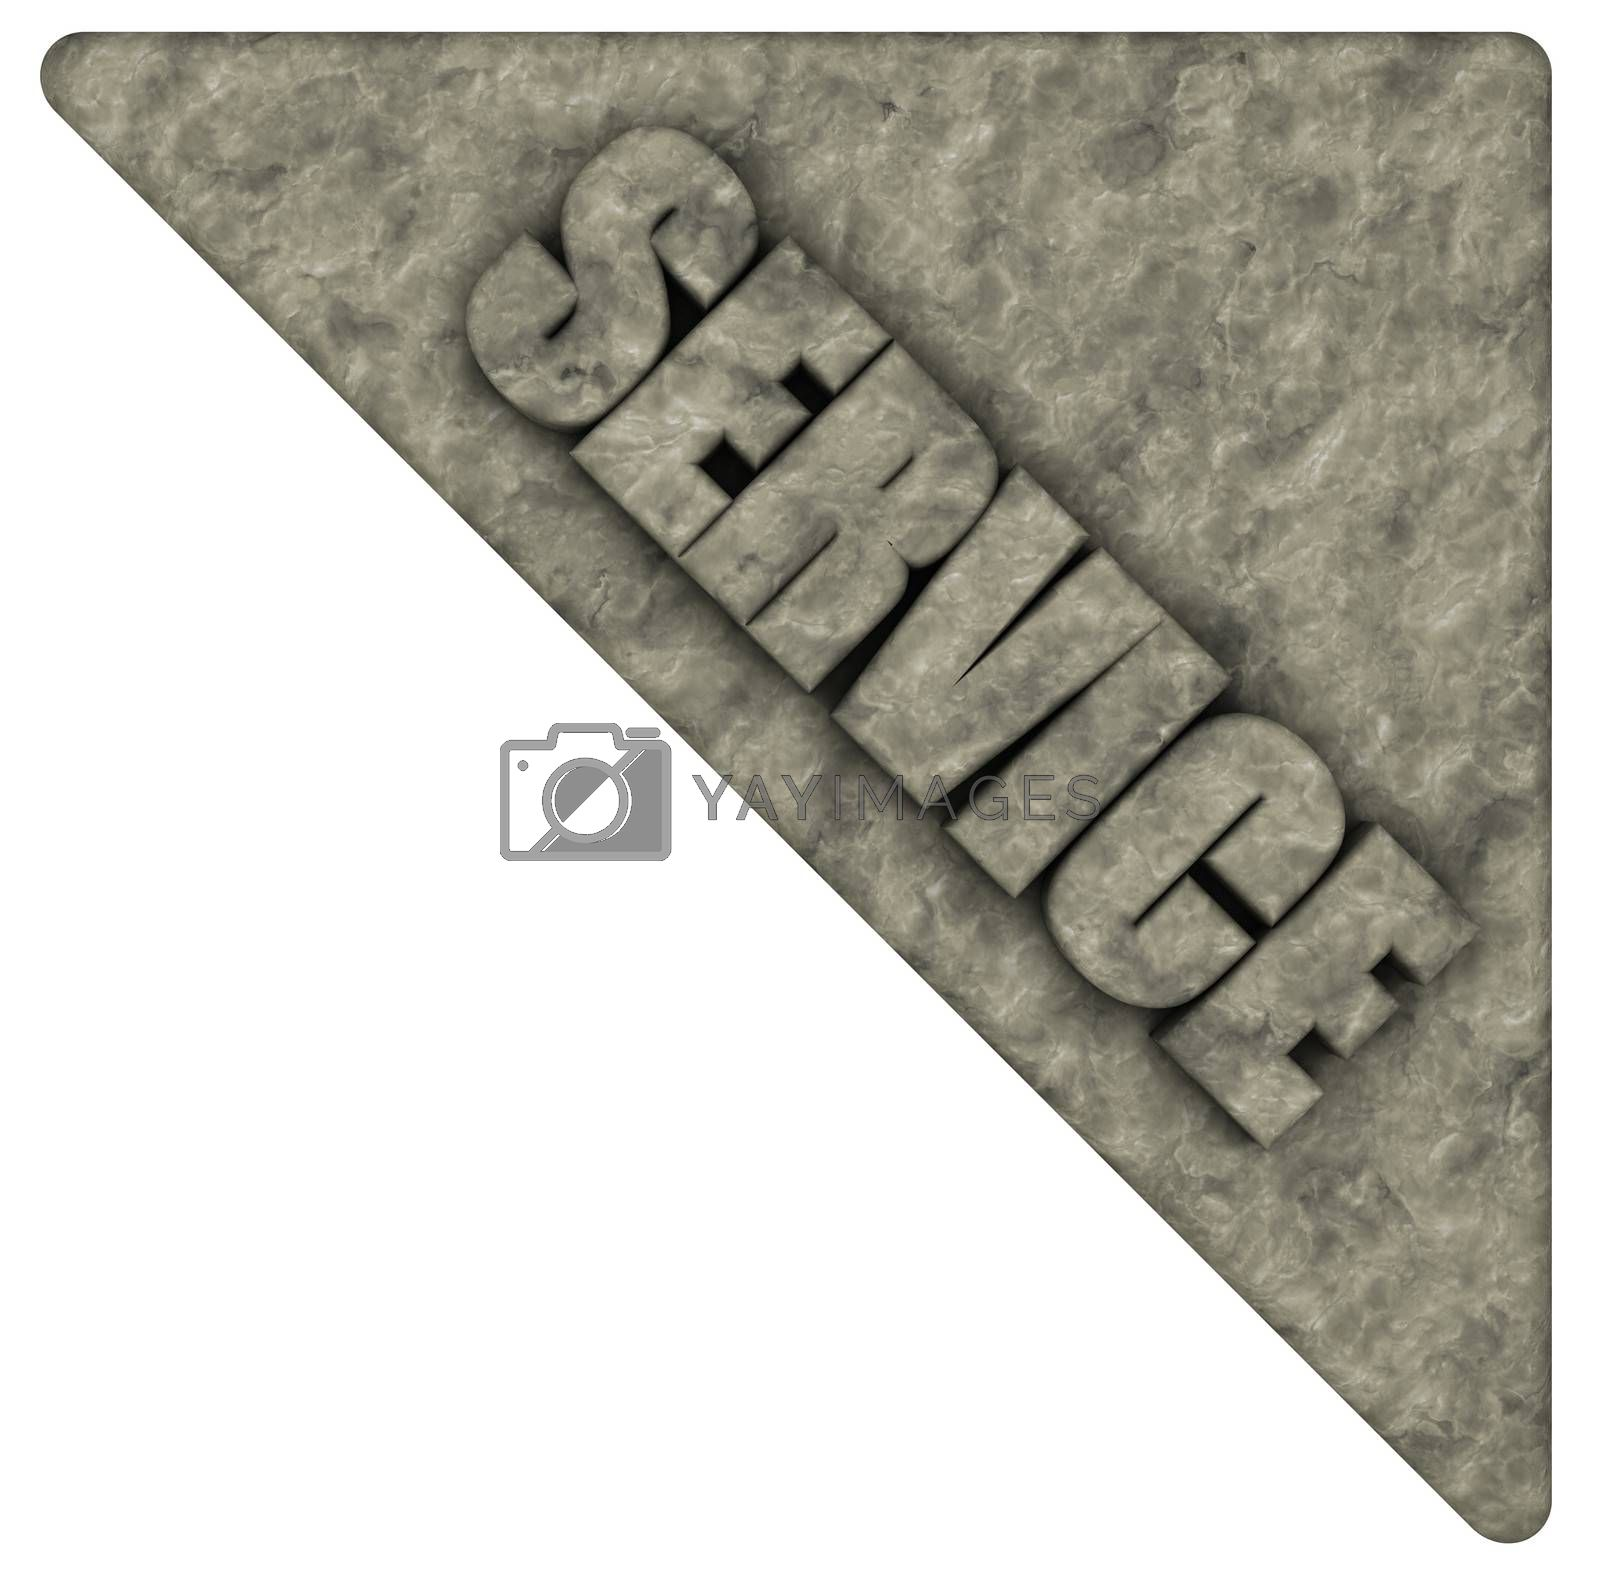 the word service on stone corner - 3d illustration